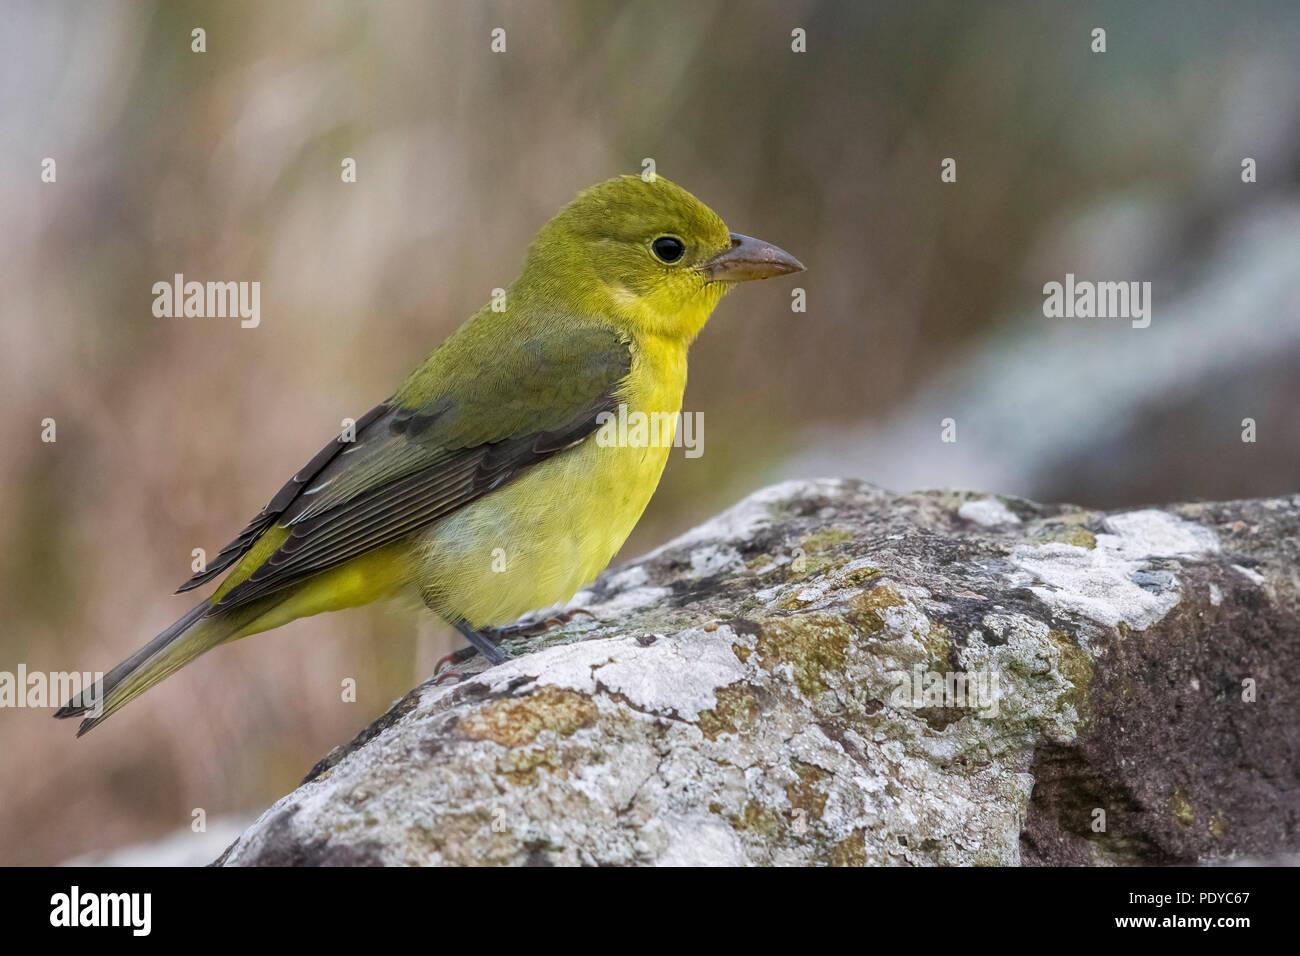 Scarlet Tanager; Piranga olivacea - Stock Image